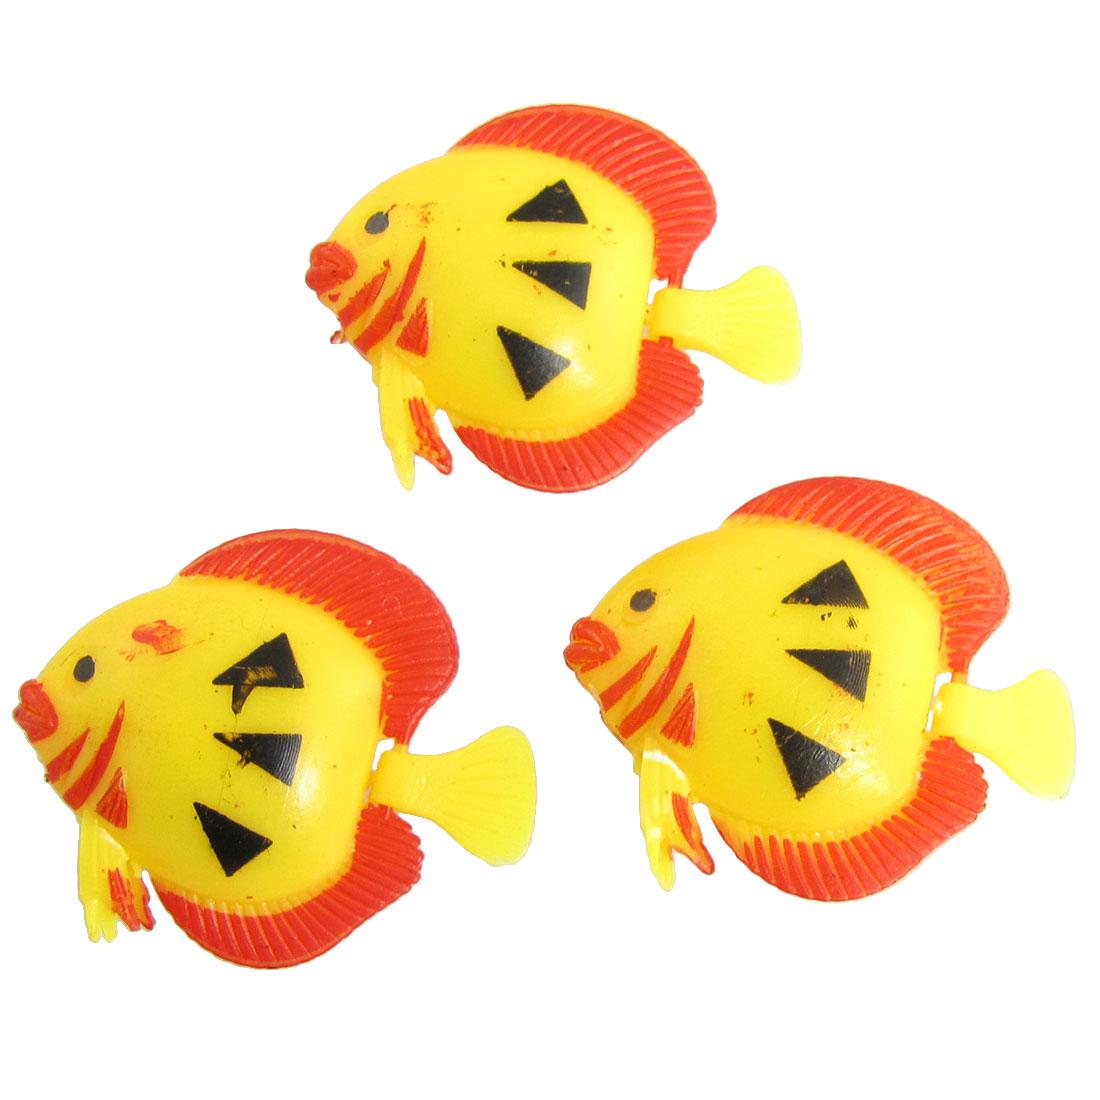 3 Pcs Plastic Yellow Red Tropical Fish Aquarium Decor